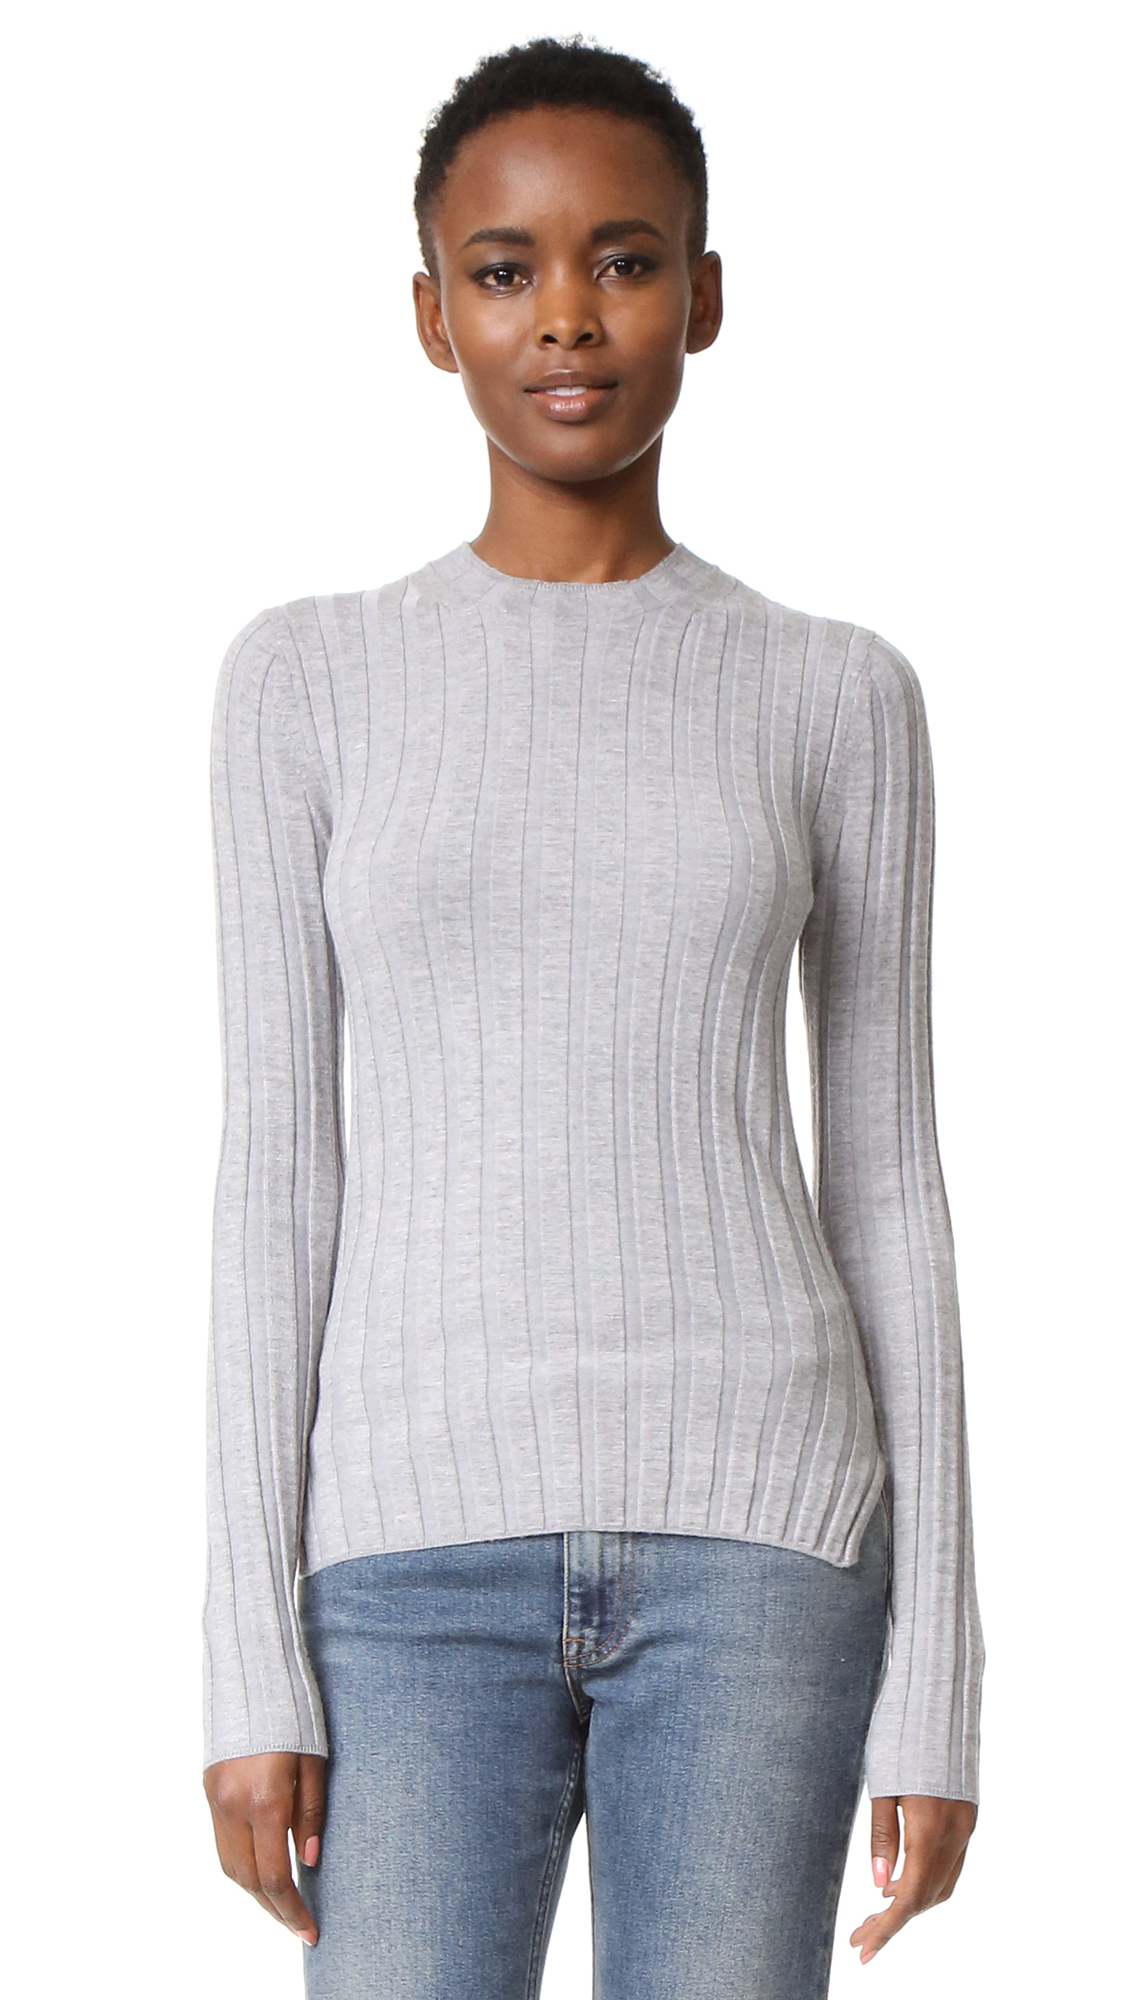 Acne Studios Carin Ribbed Merino Sweater - Silver Grey at Shopbop